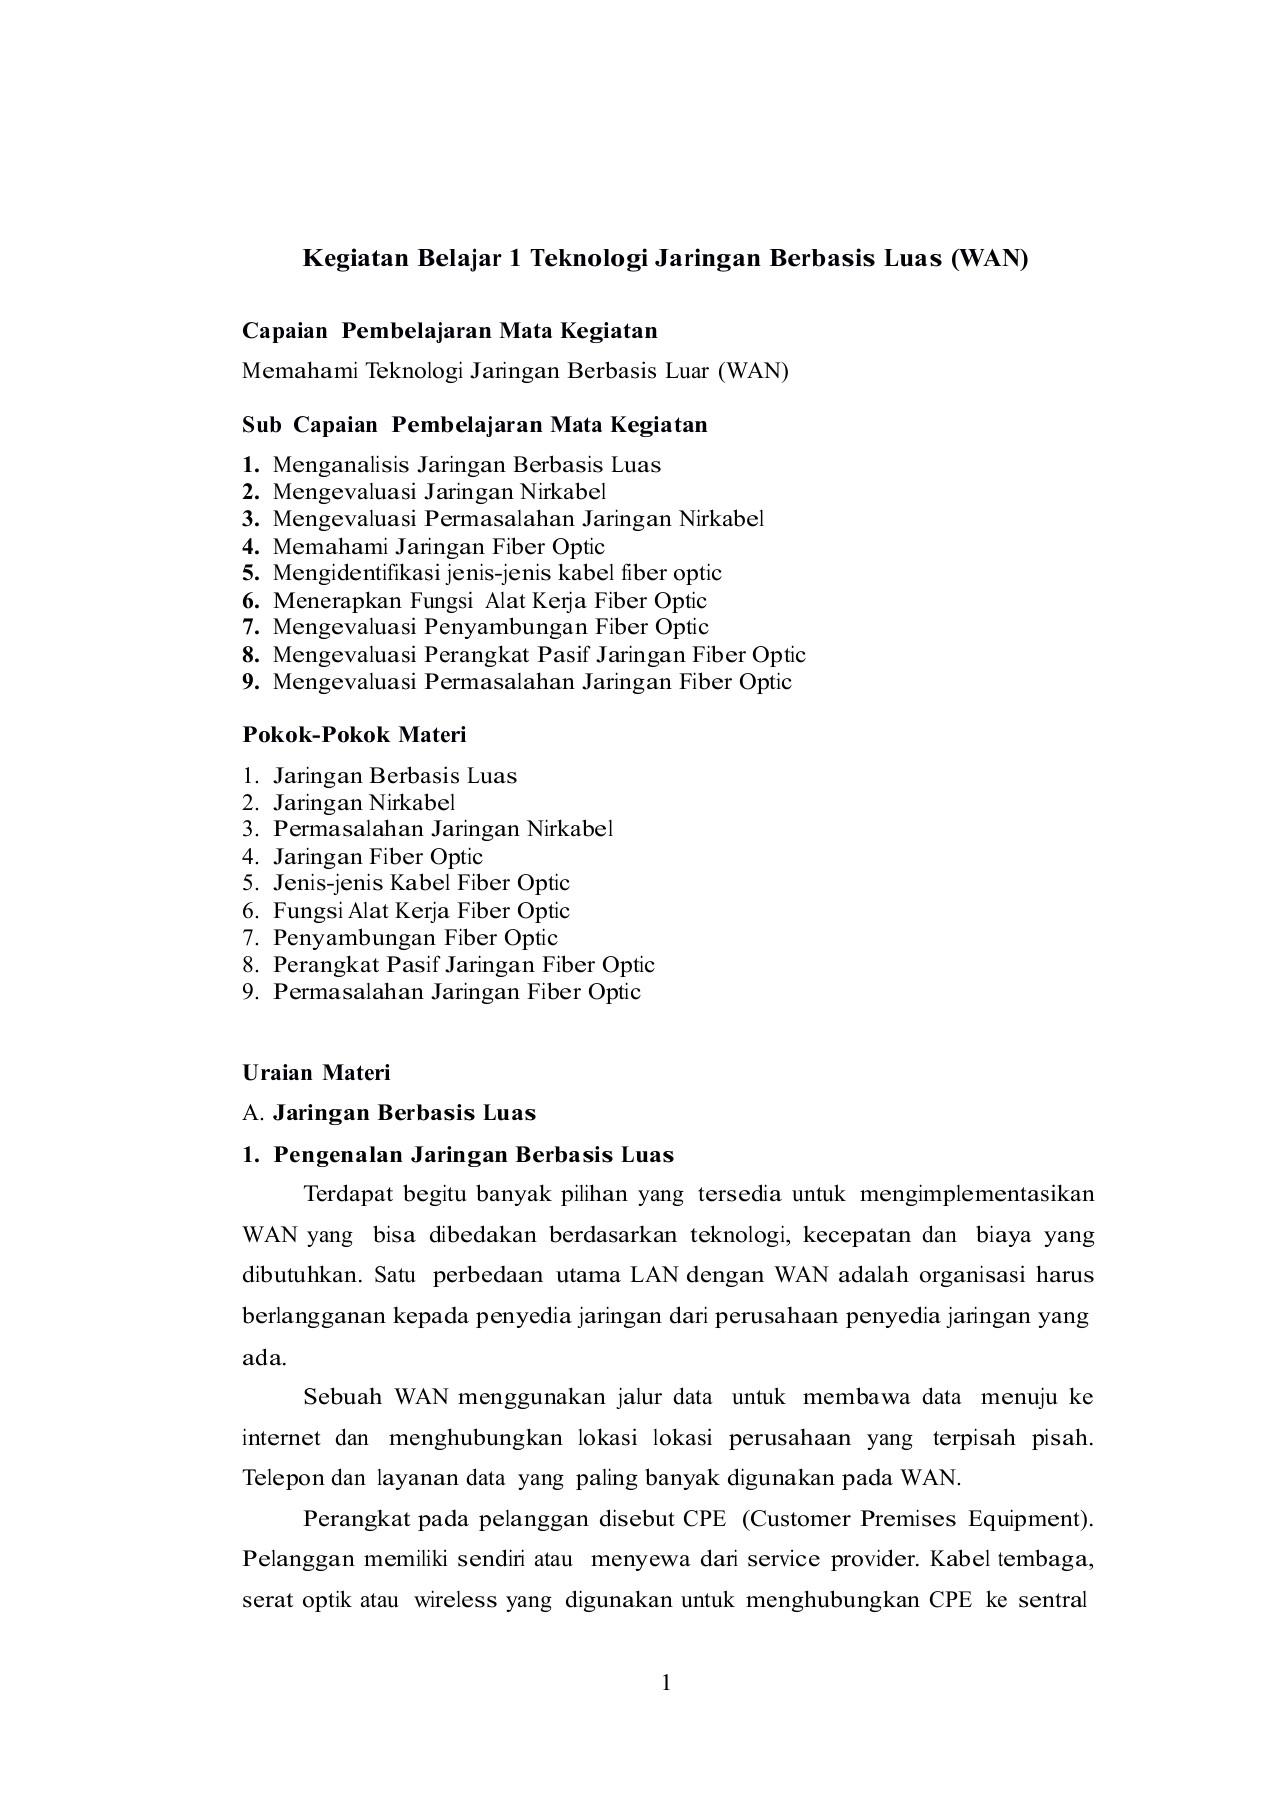 Penyambungan Internet : penyambungan, internet, Materi_Teknologi_Jaringan_Berbasis_Luas, (WAN)